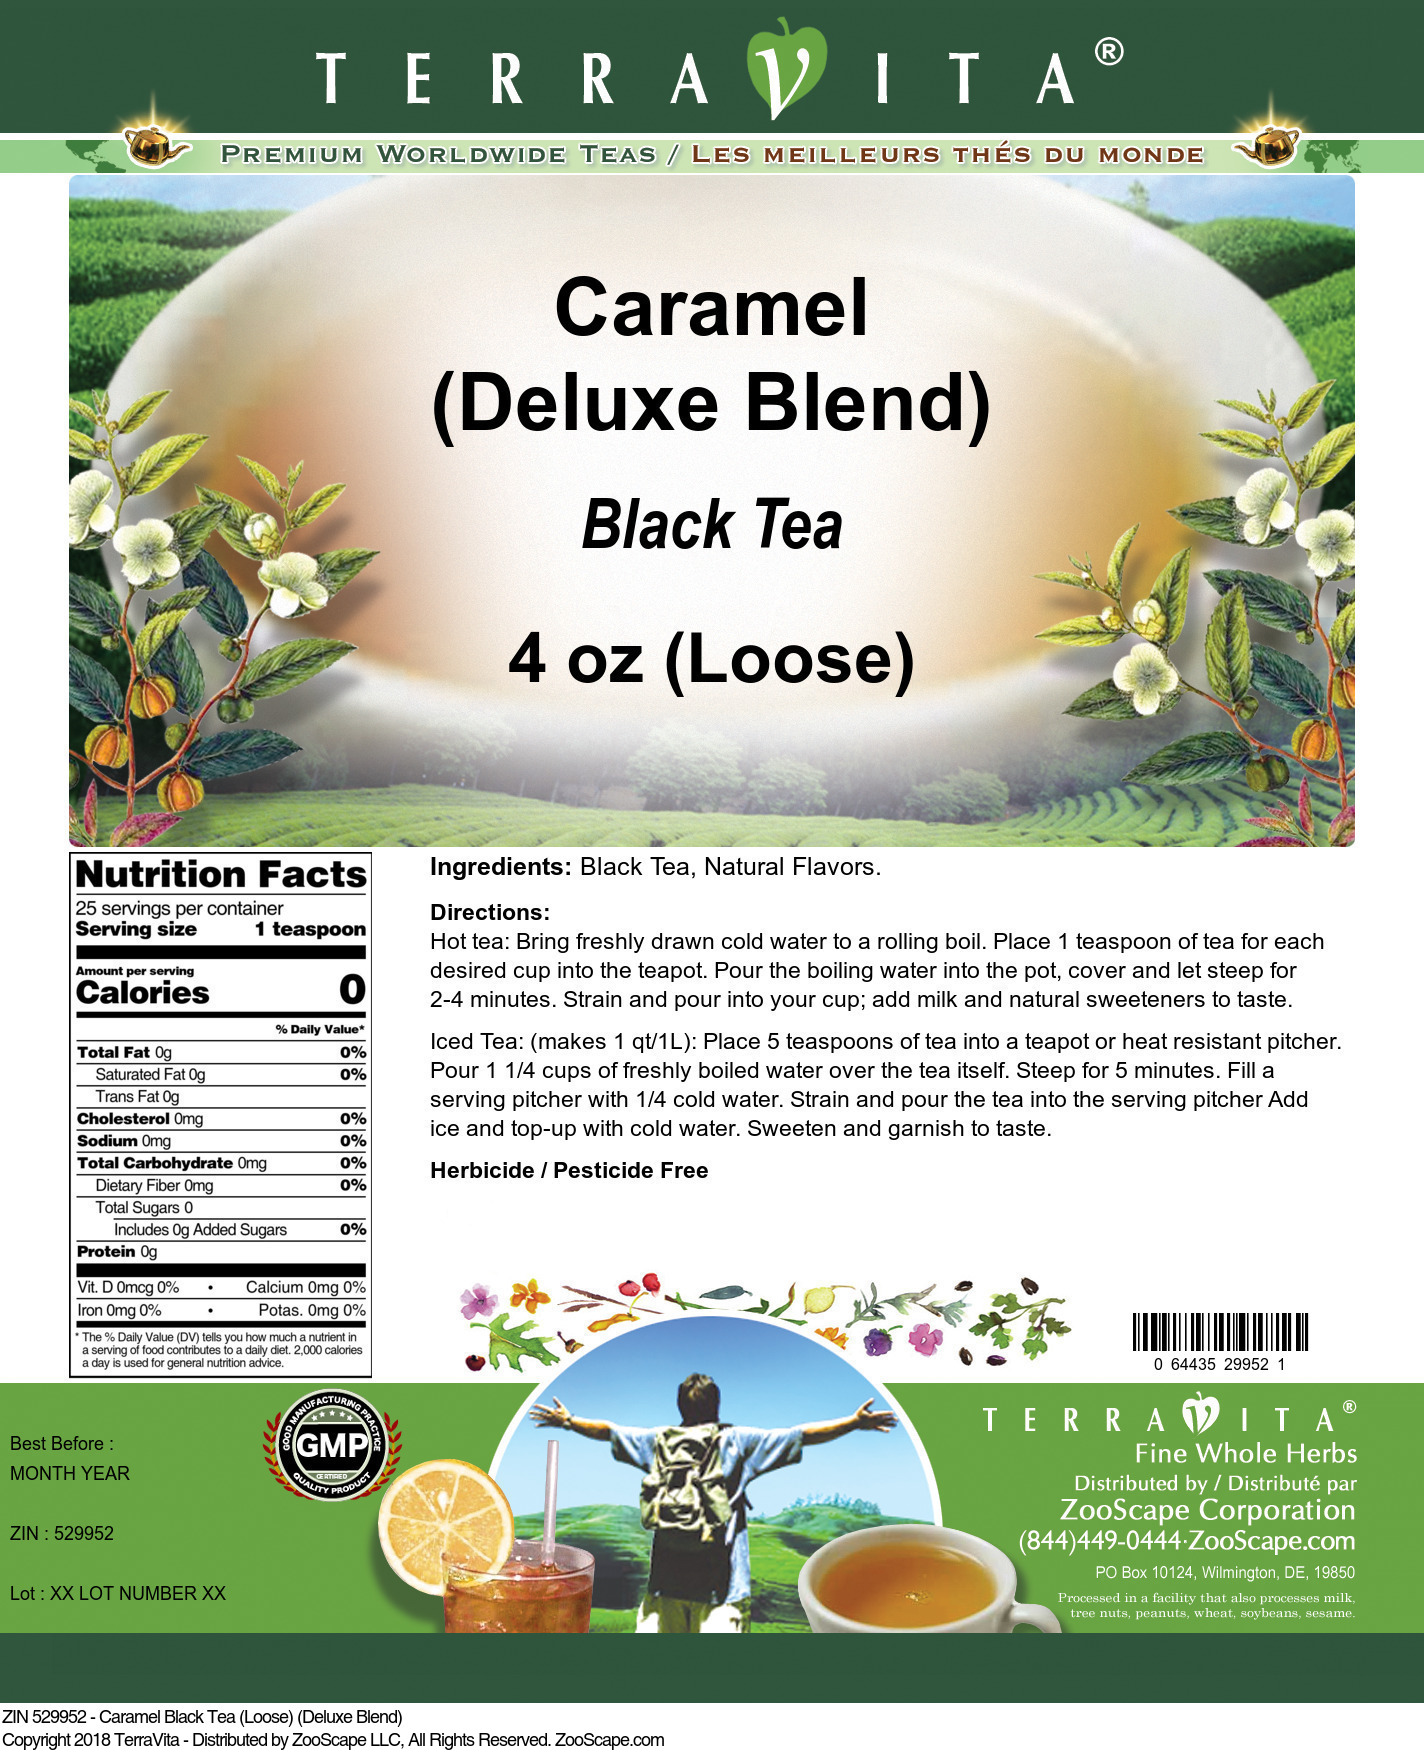 Caramel Black Tea (Loose) (Deluxe Blend)